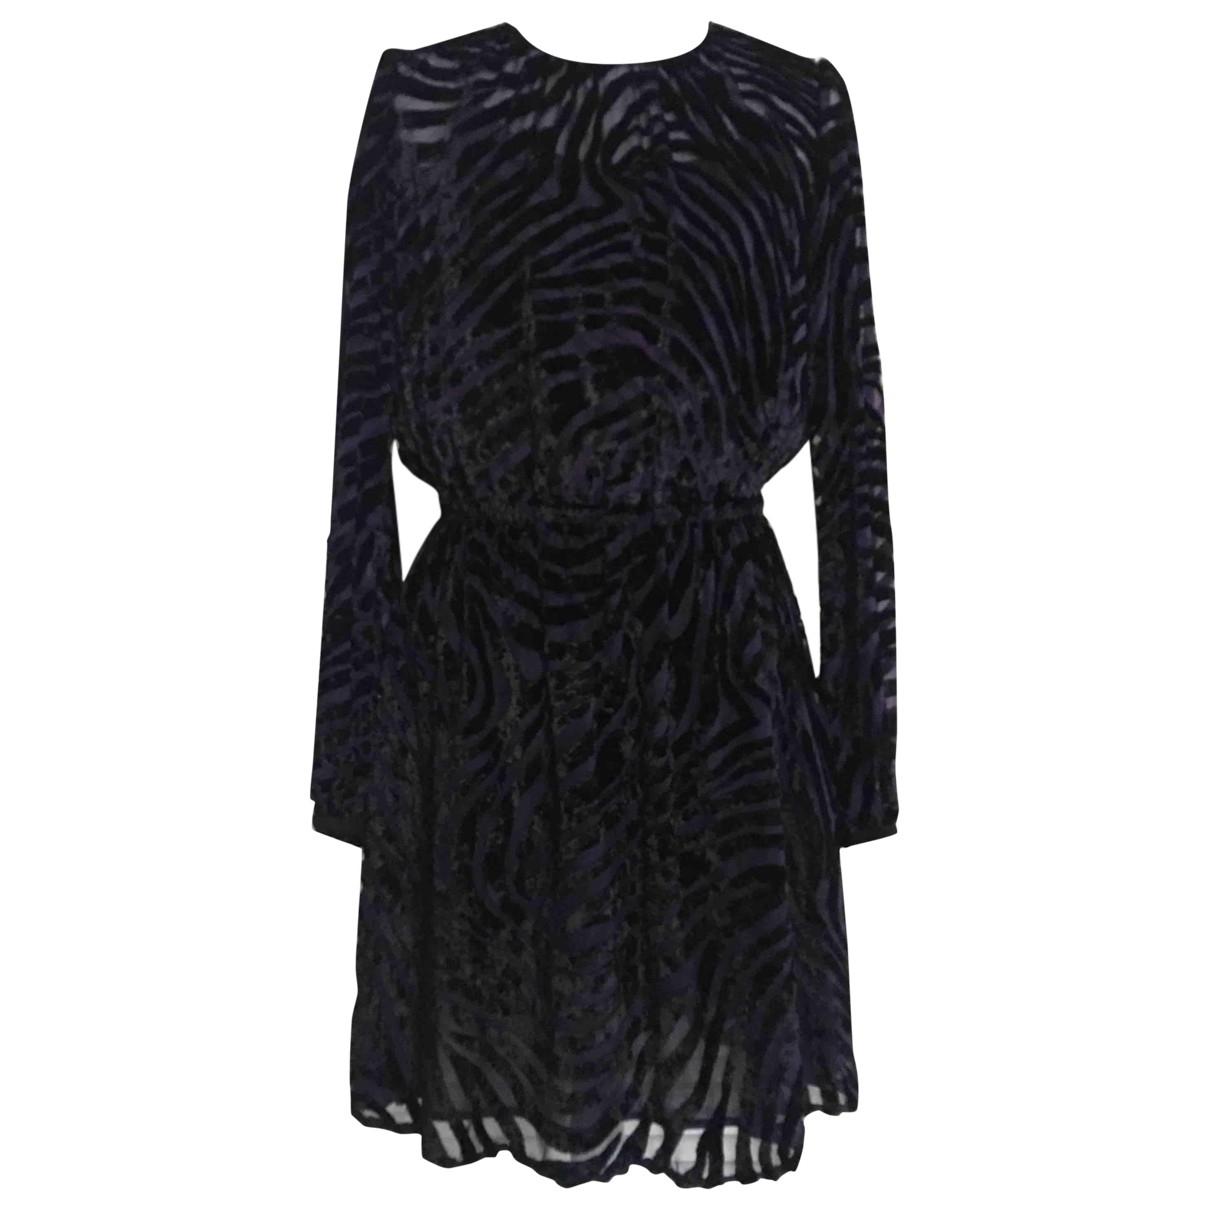 Michael Kors \N Purple dress for Women M International